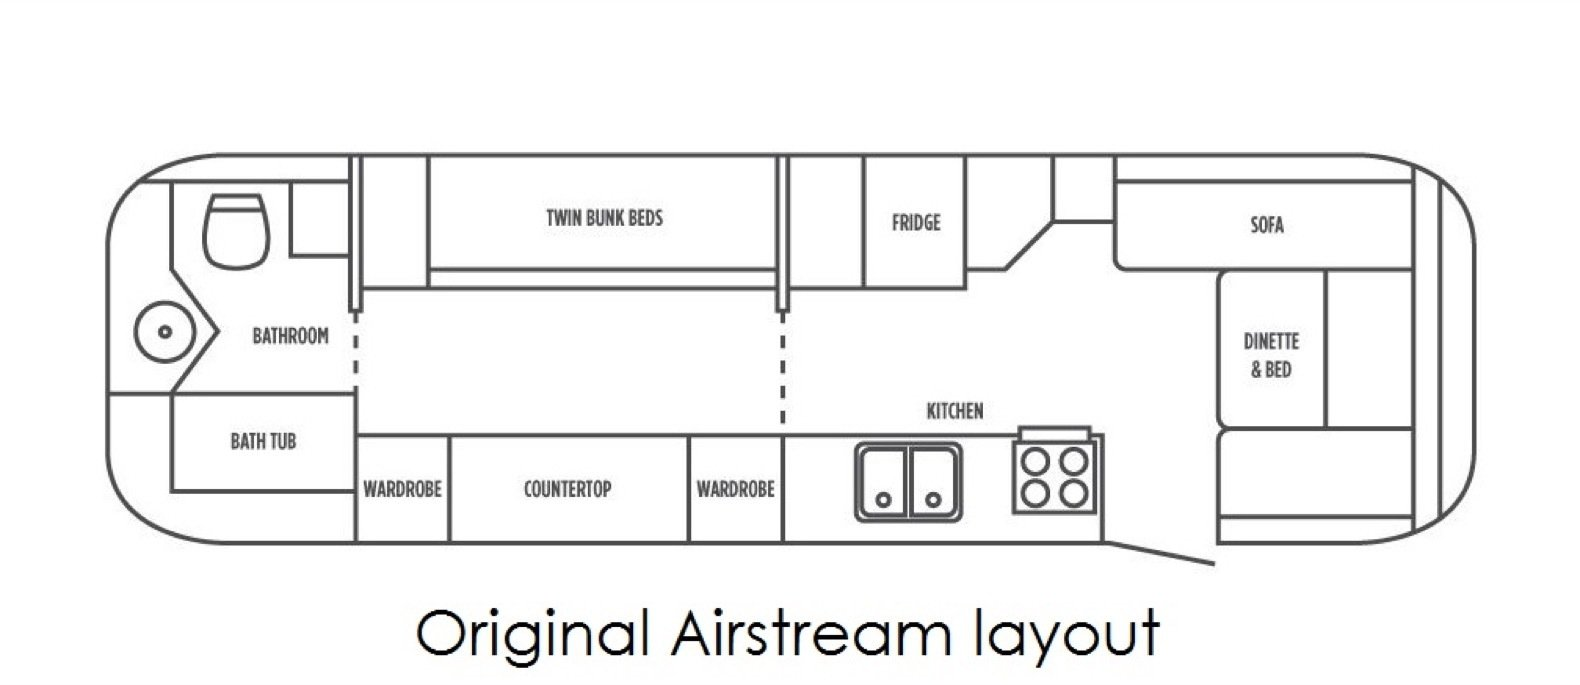 Before: Peanut Airstream Land Yacht floor plan